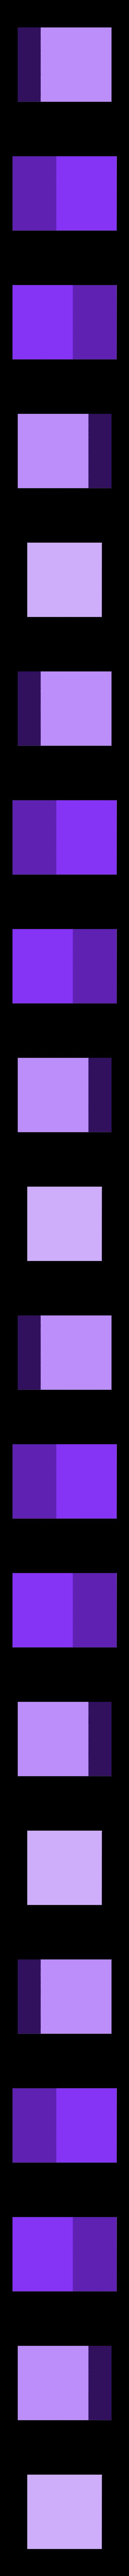 cube.stl Download free STL file geometric shapes • 3D print object, seppemachielsen